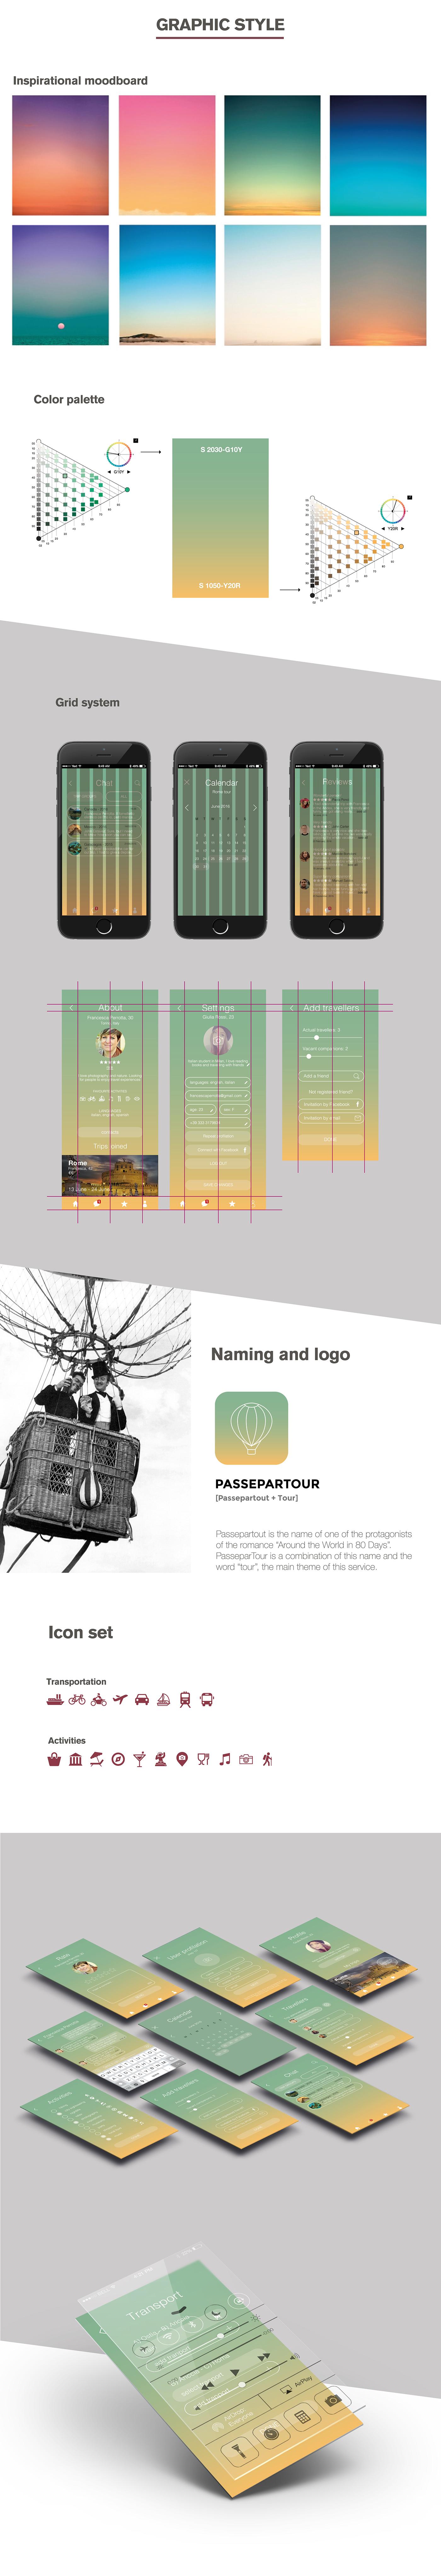 PasseparTour - traveling mobile application on Behance